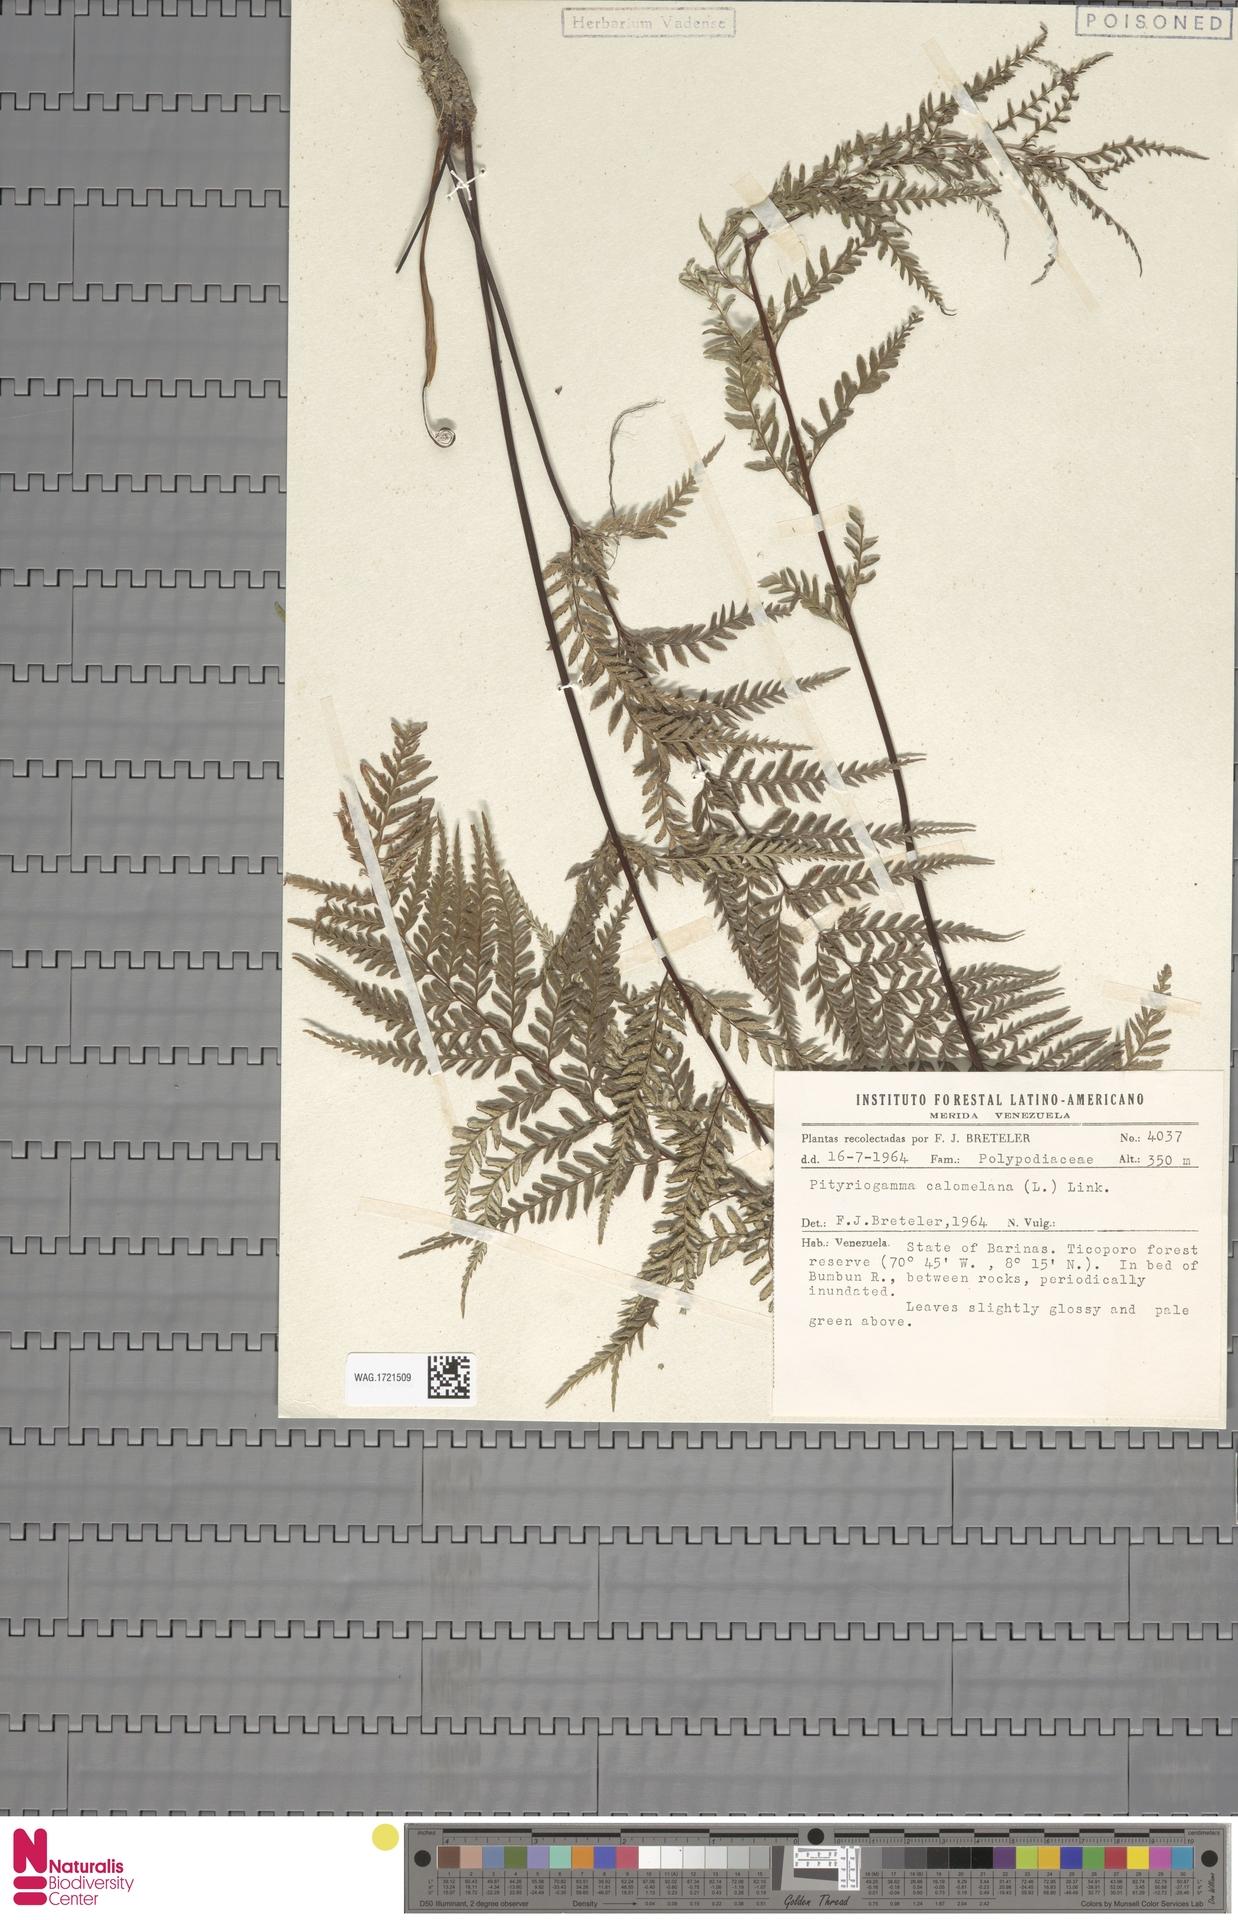 WAG.1721509 | Pityrogramma calomelanos (L.) Link